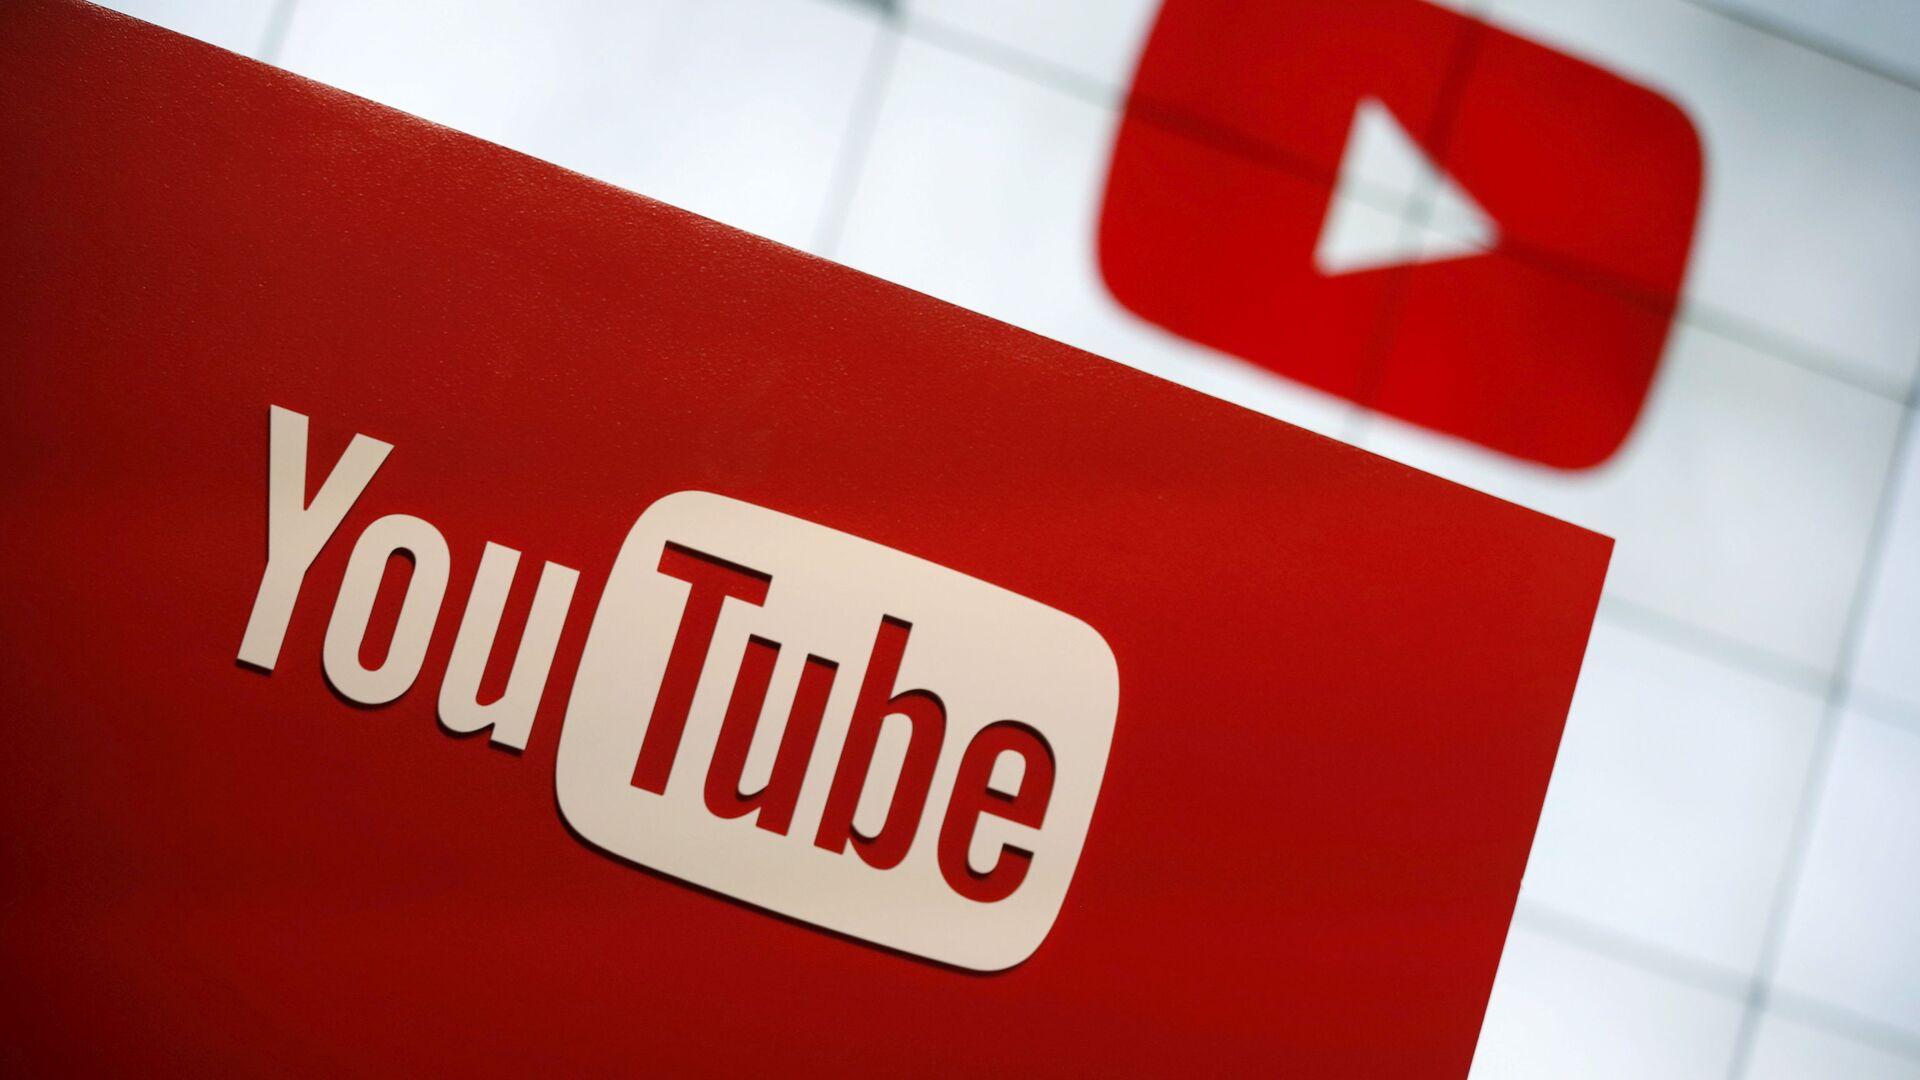 YouTube logo at the YouTube Space LA in Playa Del Rey, Los Angeles, California, United States October 21, 2015. - Sputnik International, 1920, 28.09.2021